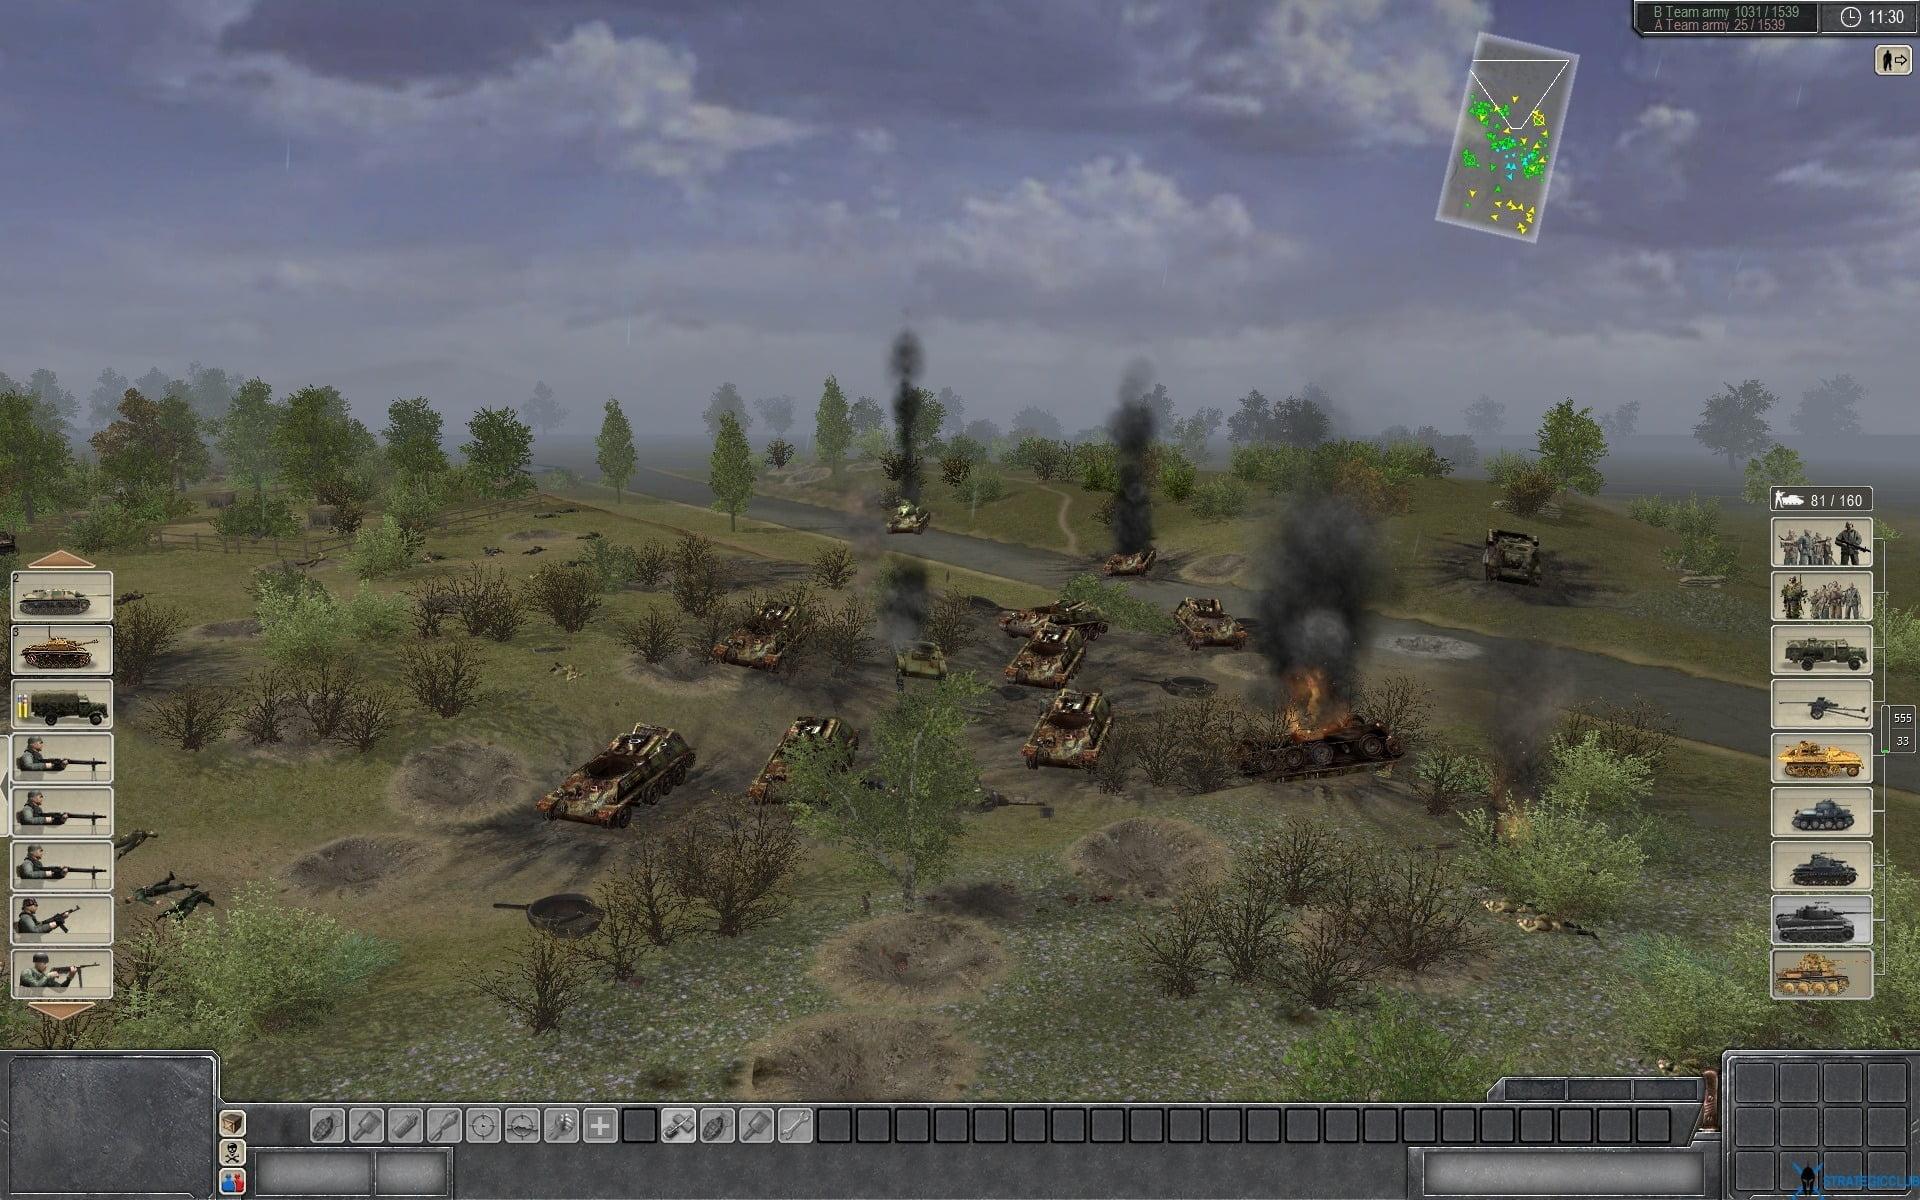 russian Tank wrecks